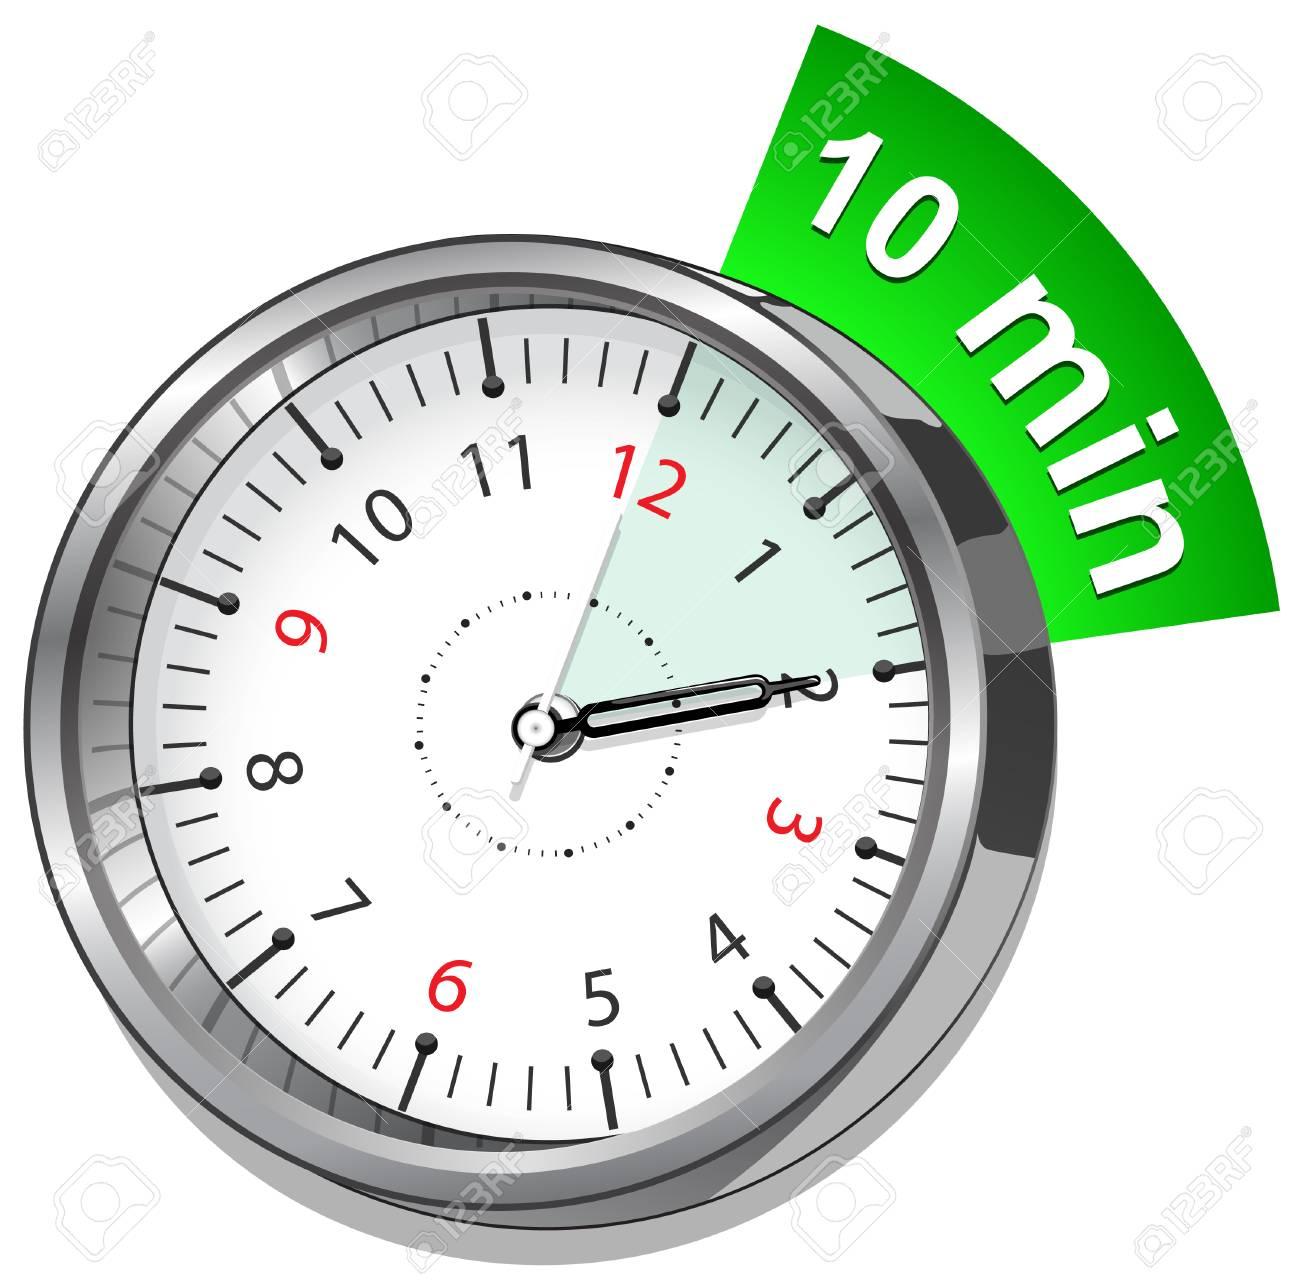 1o minute timer